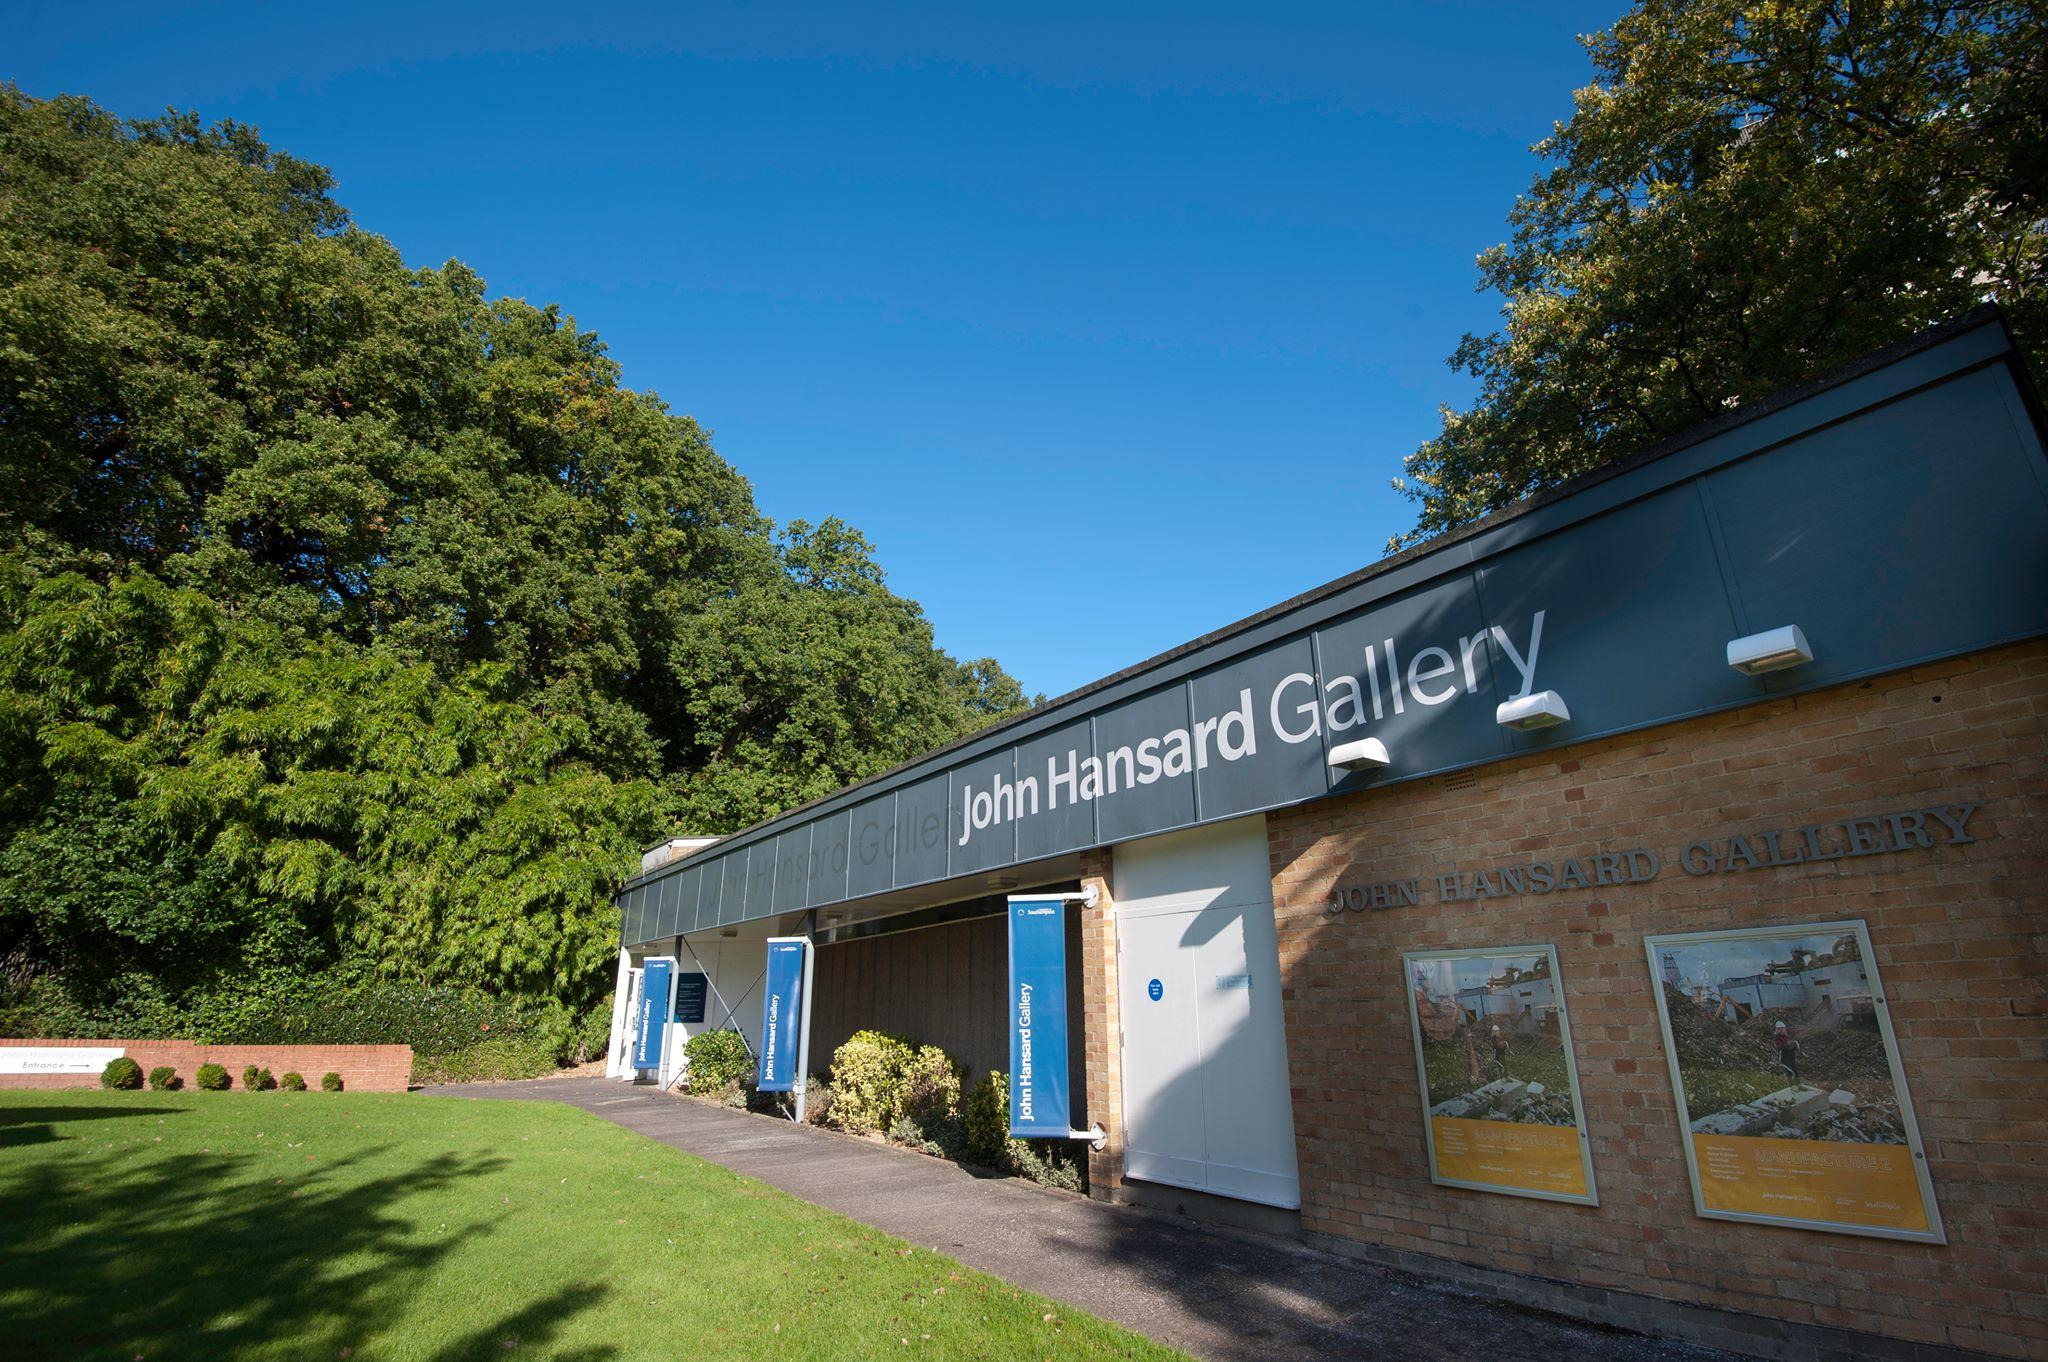 John hansard gallery cover